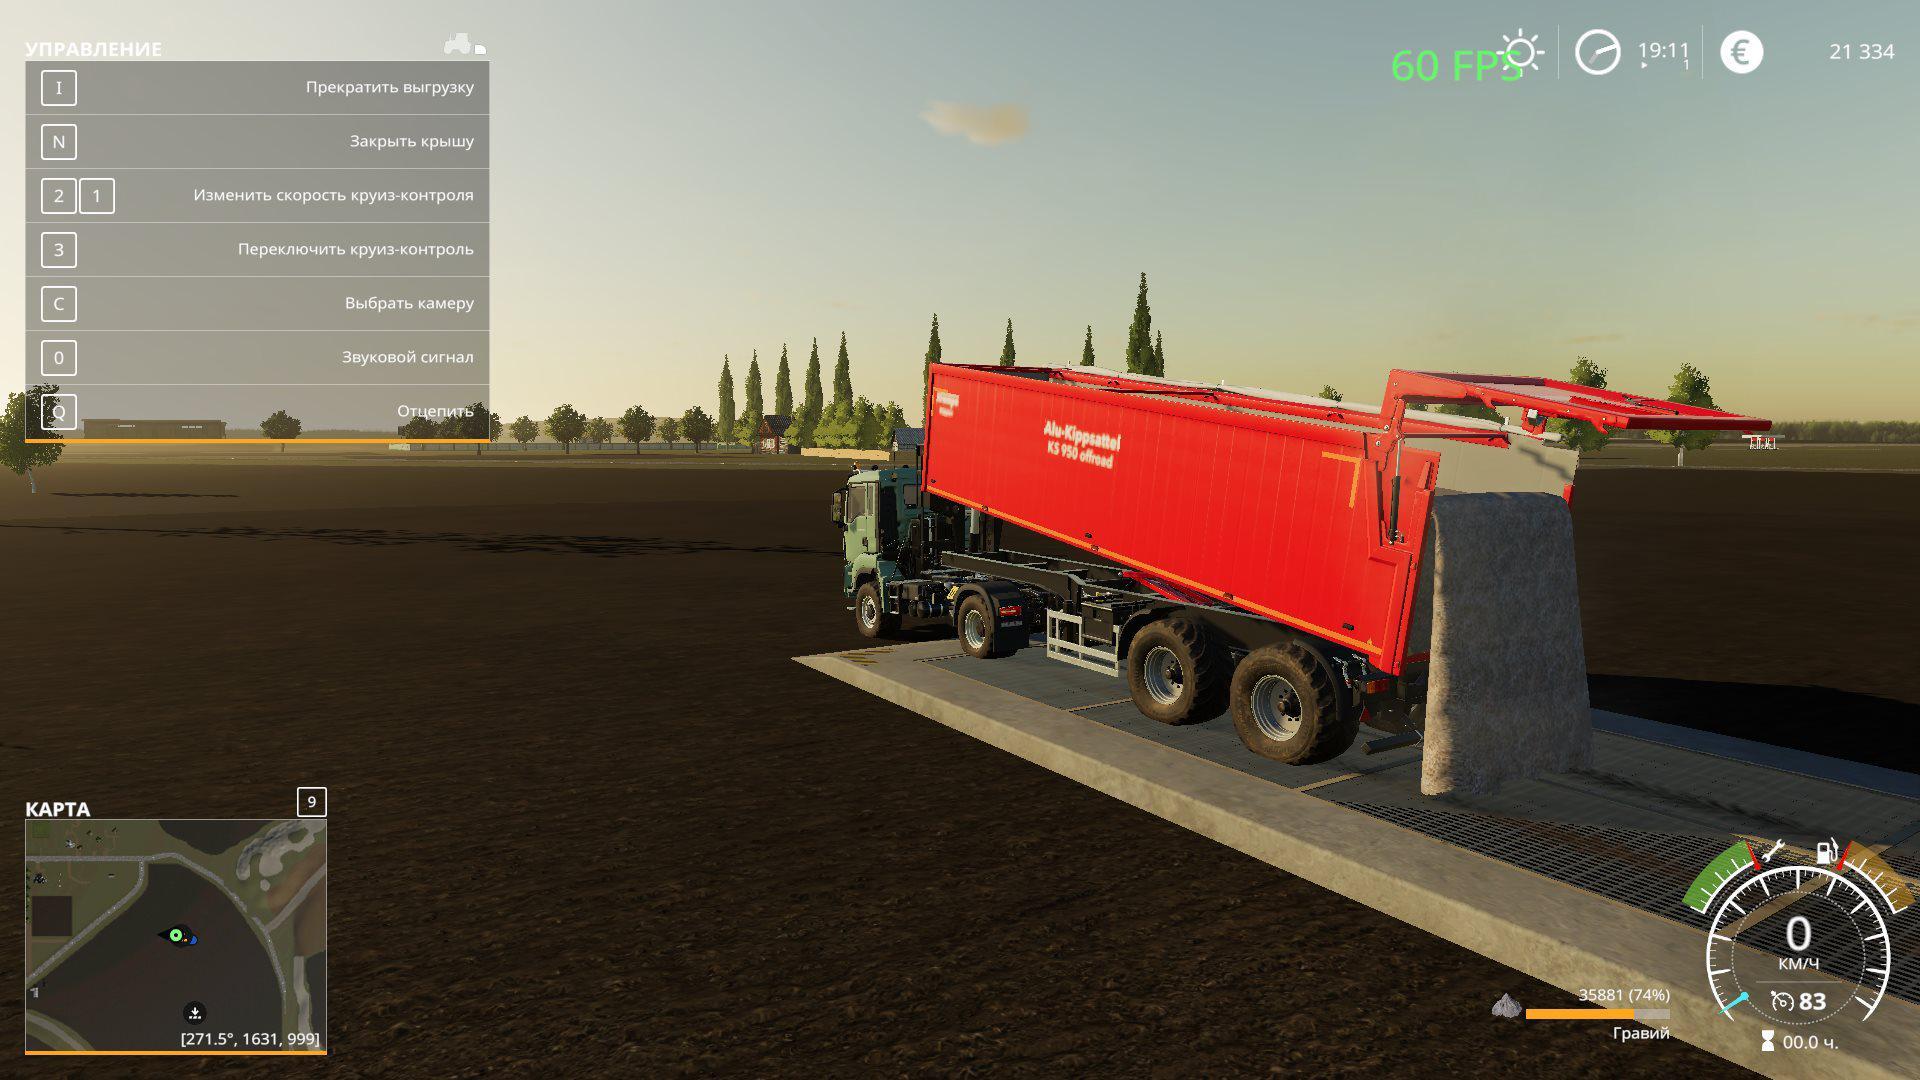 NF Mod Map Gravel pit v1 0 FS19 - Farming Simulator 19 Mod